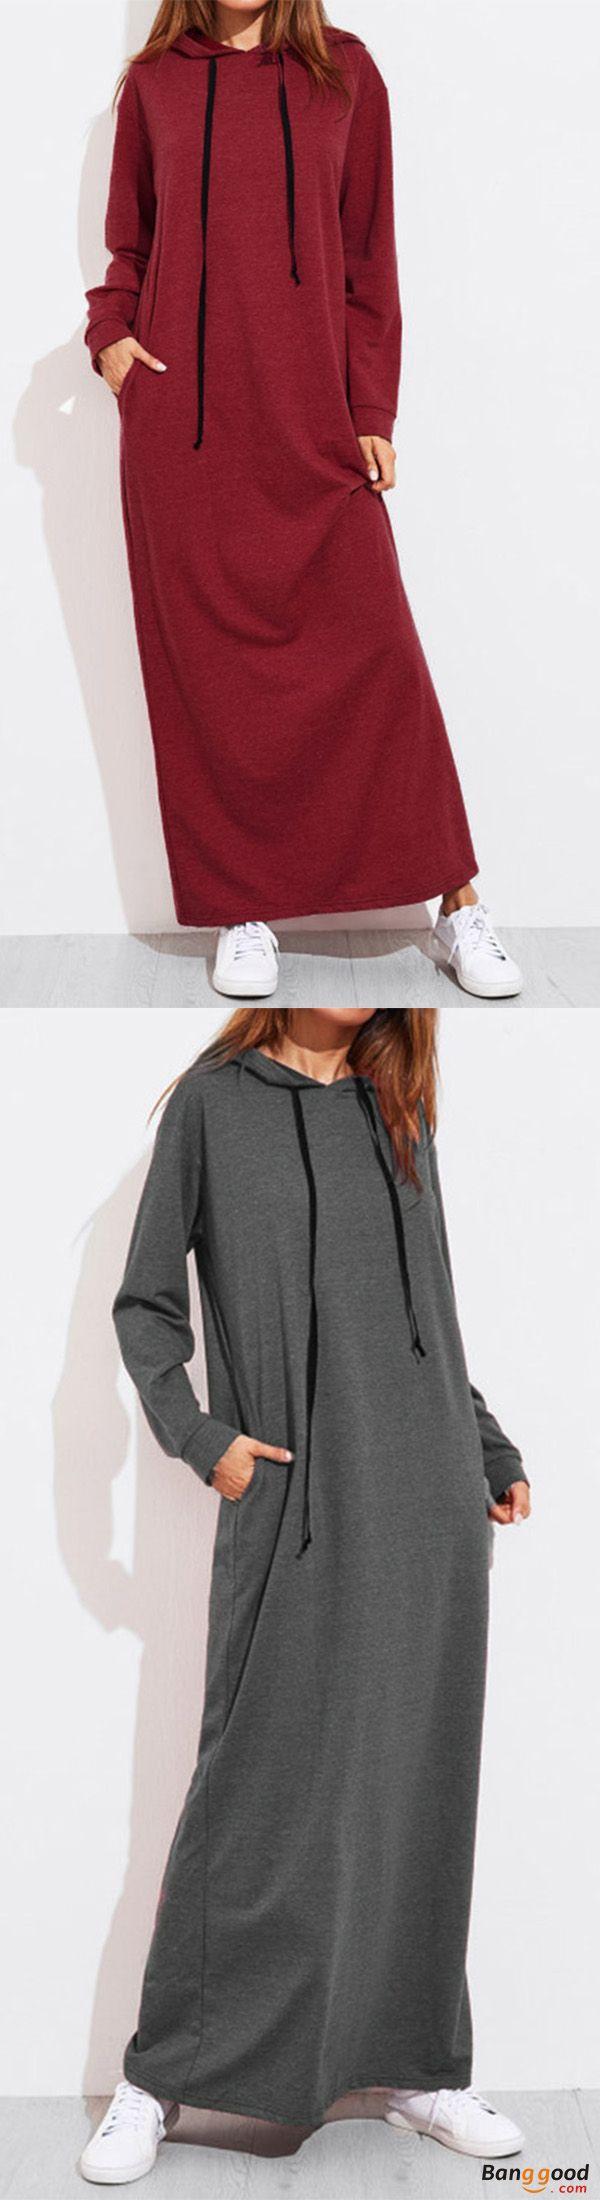 Casual women solid color full sleeve long hooded sweatshirt dress